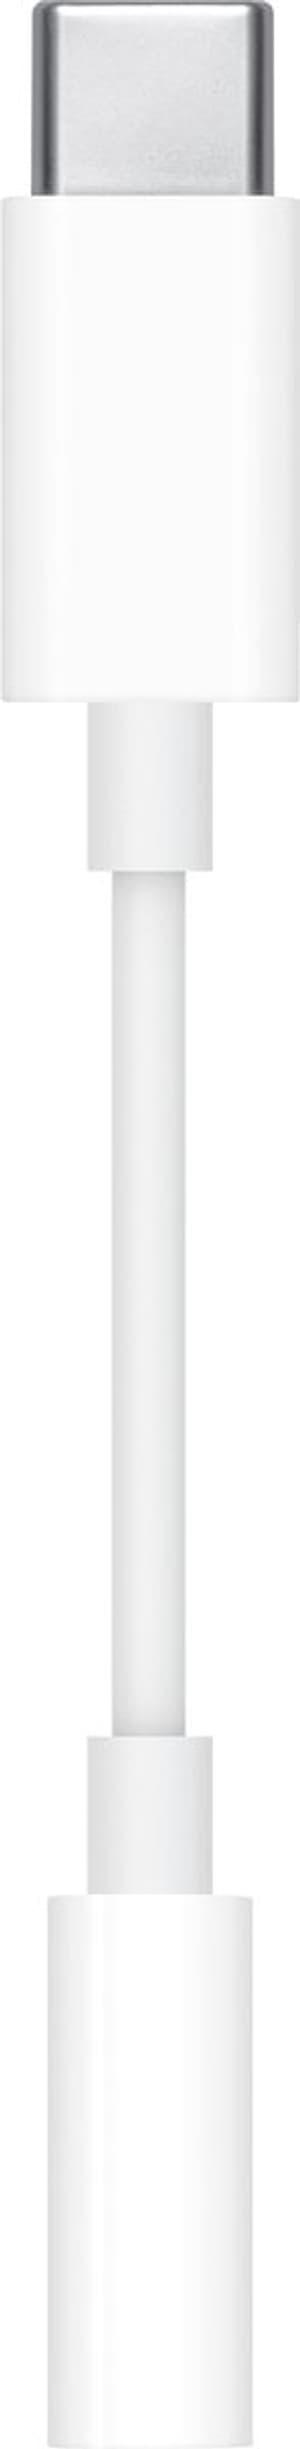 USB-C auf 3,5 mm Kopfhöreranschluss Adapter